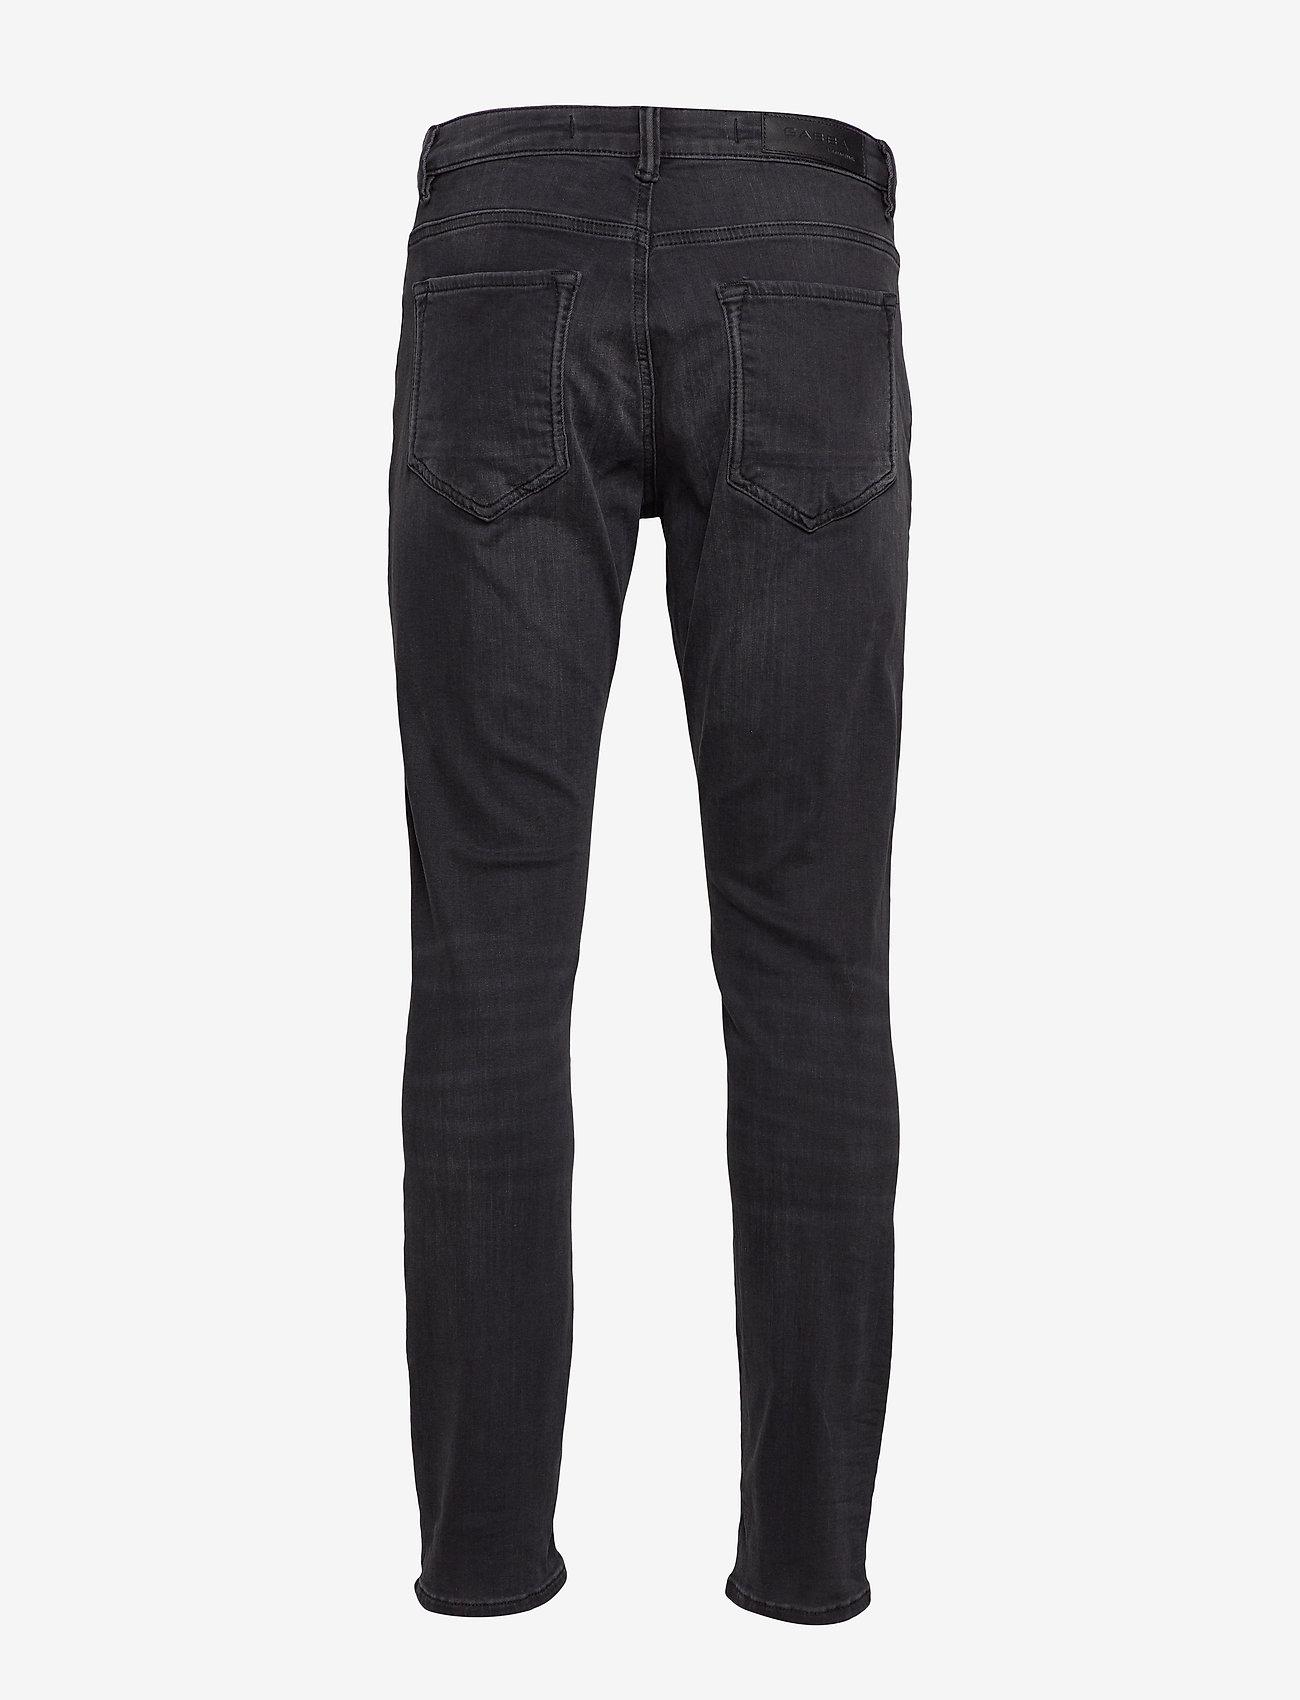 Gabba - Jones K3459 Jeans - slim jeans - rs1259 - 1